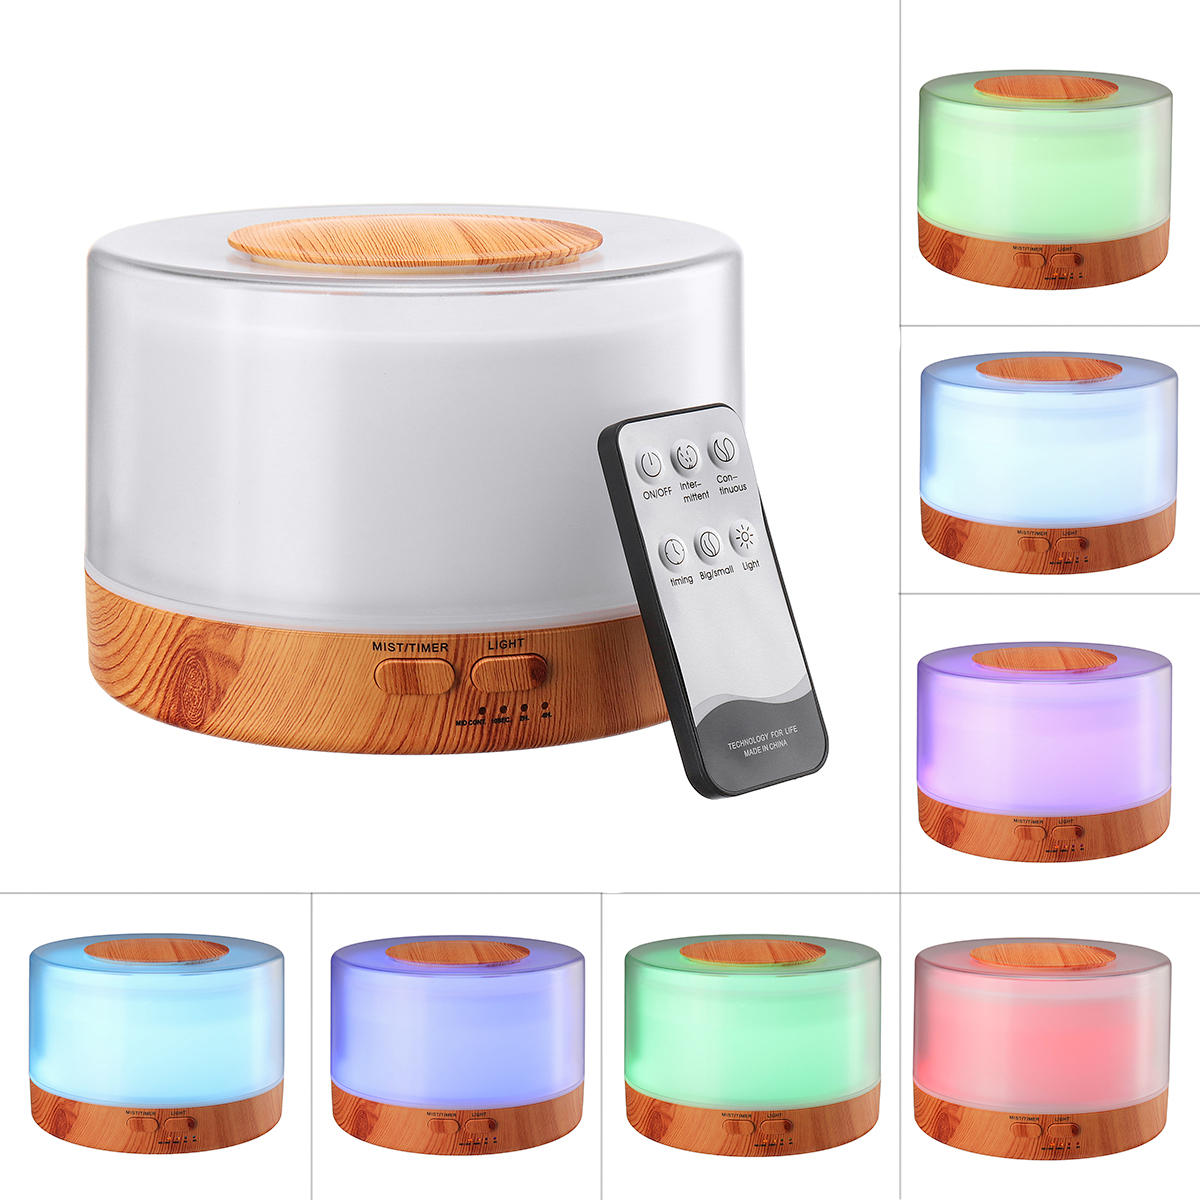 700 ML Aromaterapi Minyak Esensial Diffuser Humidifier Remote Control Humidifier 7 Warna Lampu LED